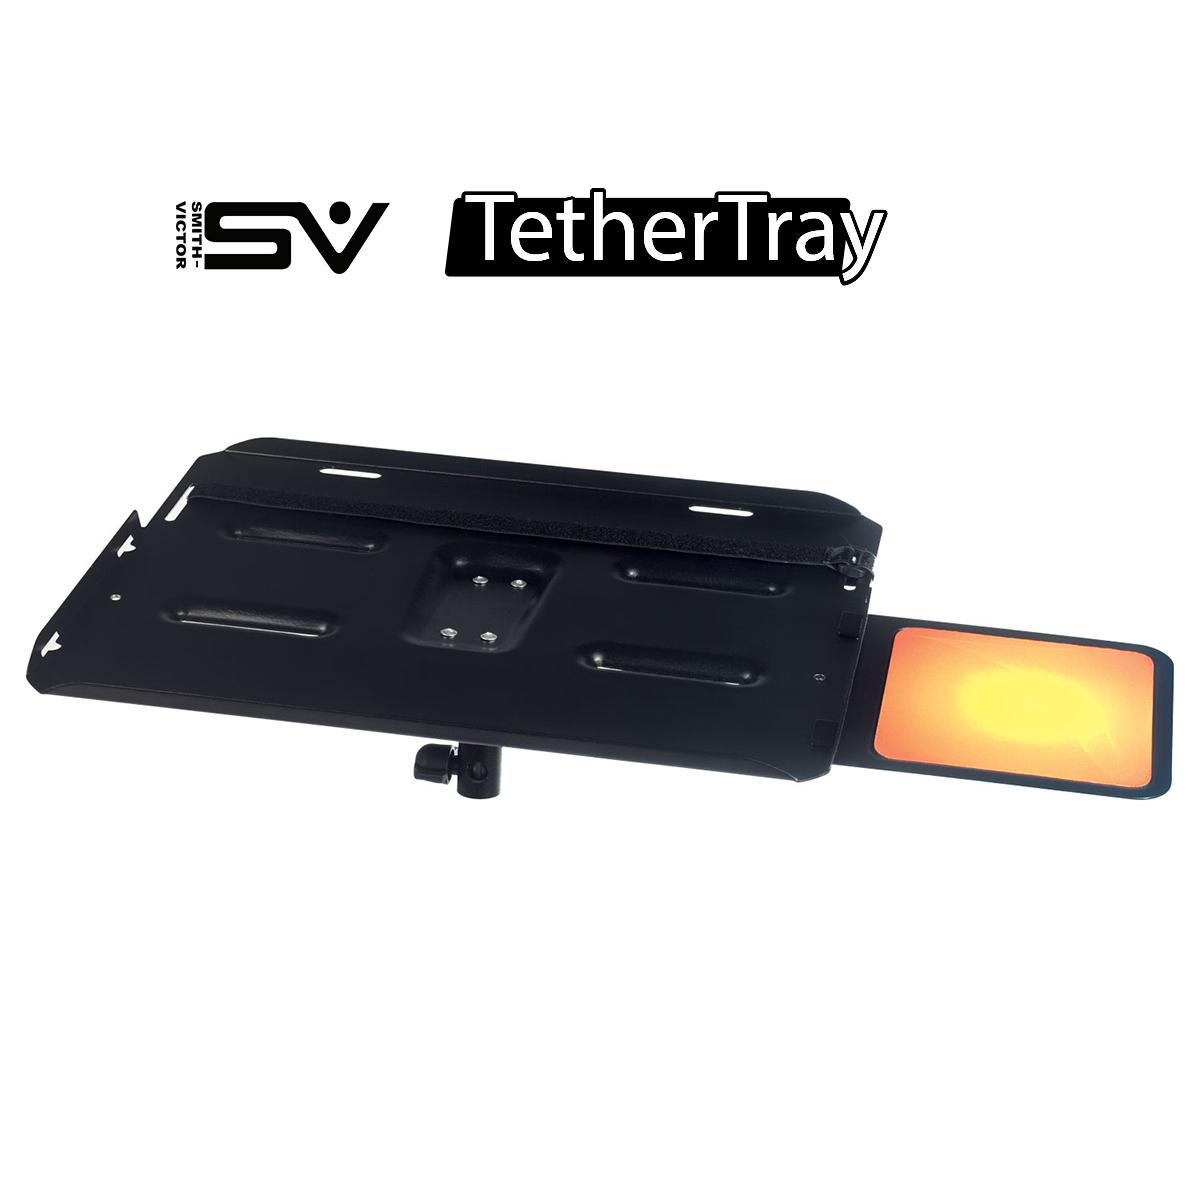 405001_Tether-Tray_A1_logos.jpg